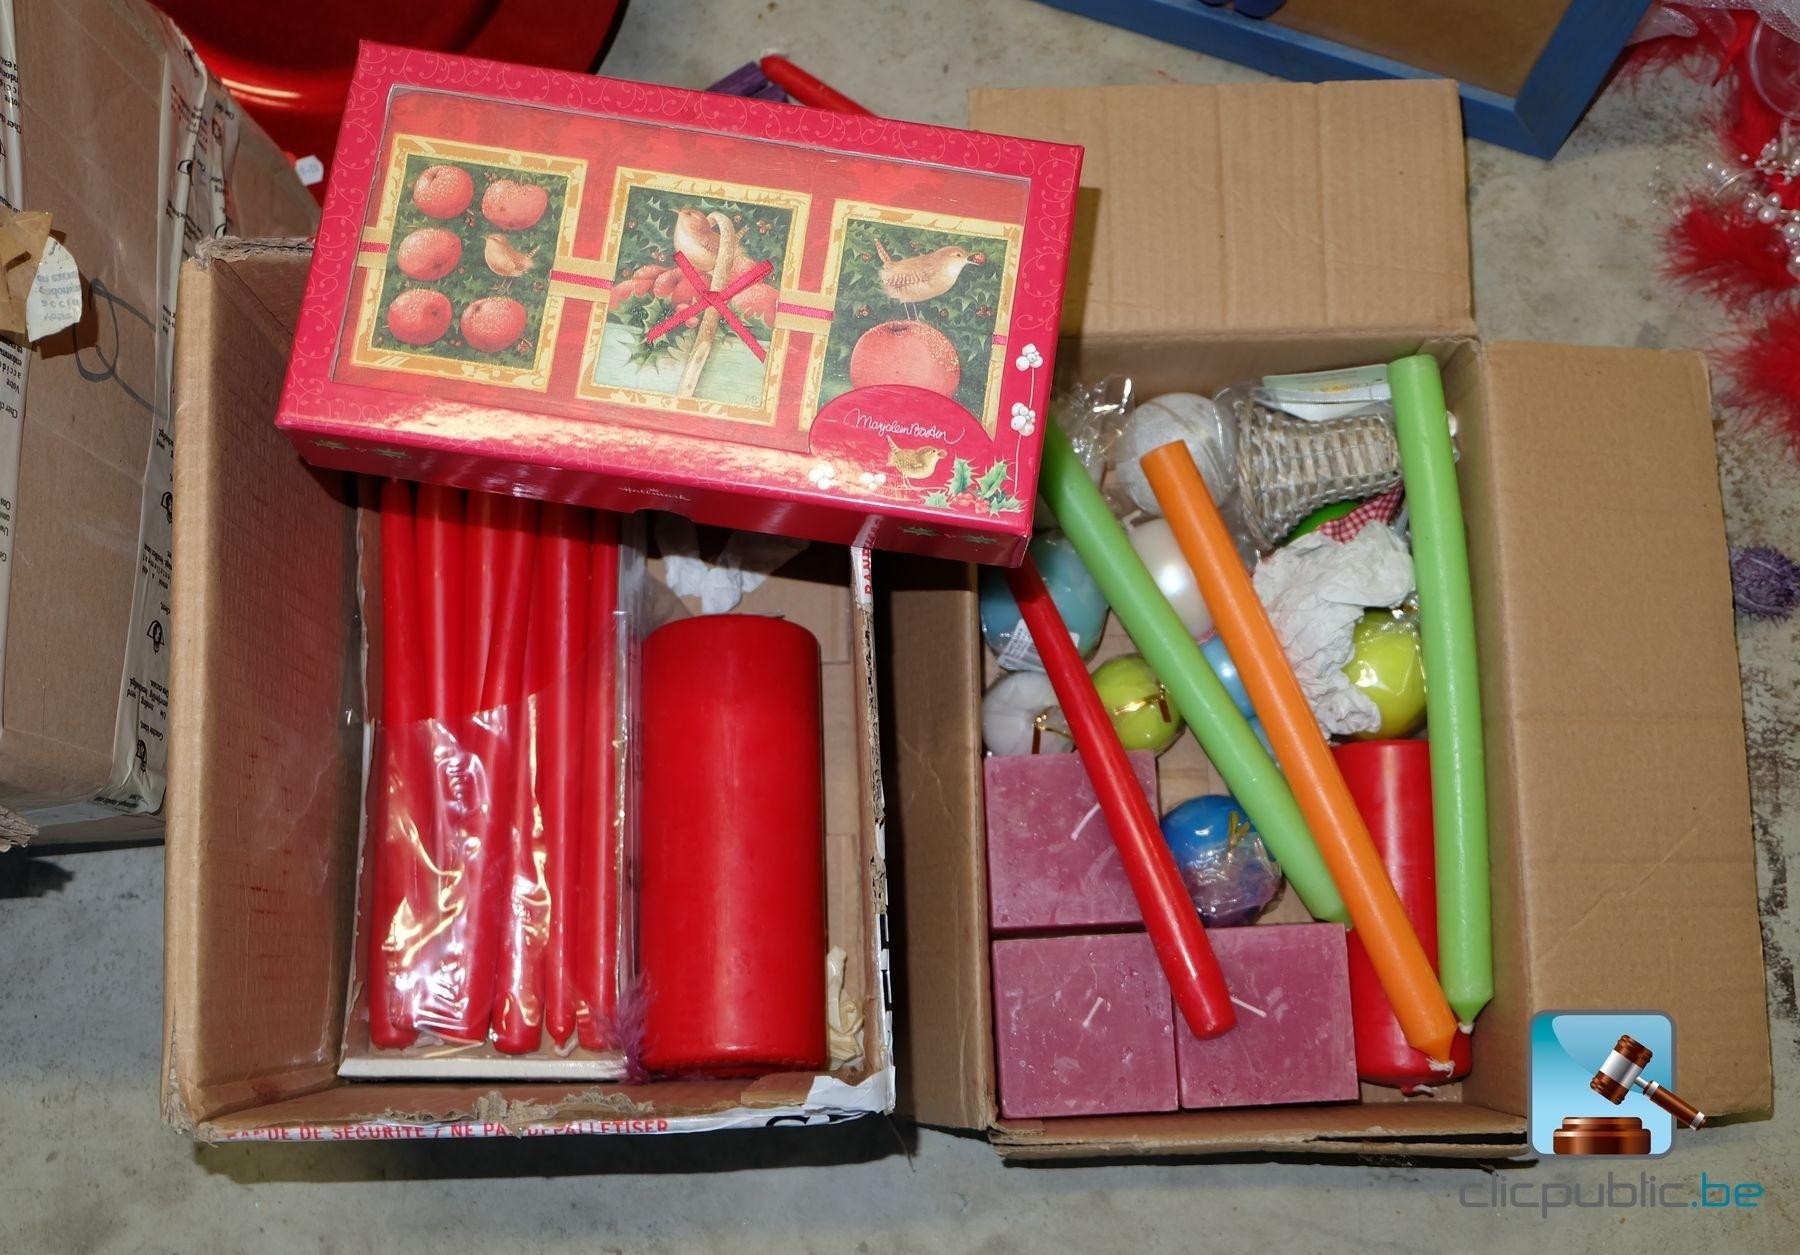 #B01B26 Décorations De Noël (ref. 27) à Vendre Sur Clicpublic.be 5319 decorations de noel a vendre 1800x1255 px @ aertt.com